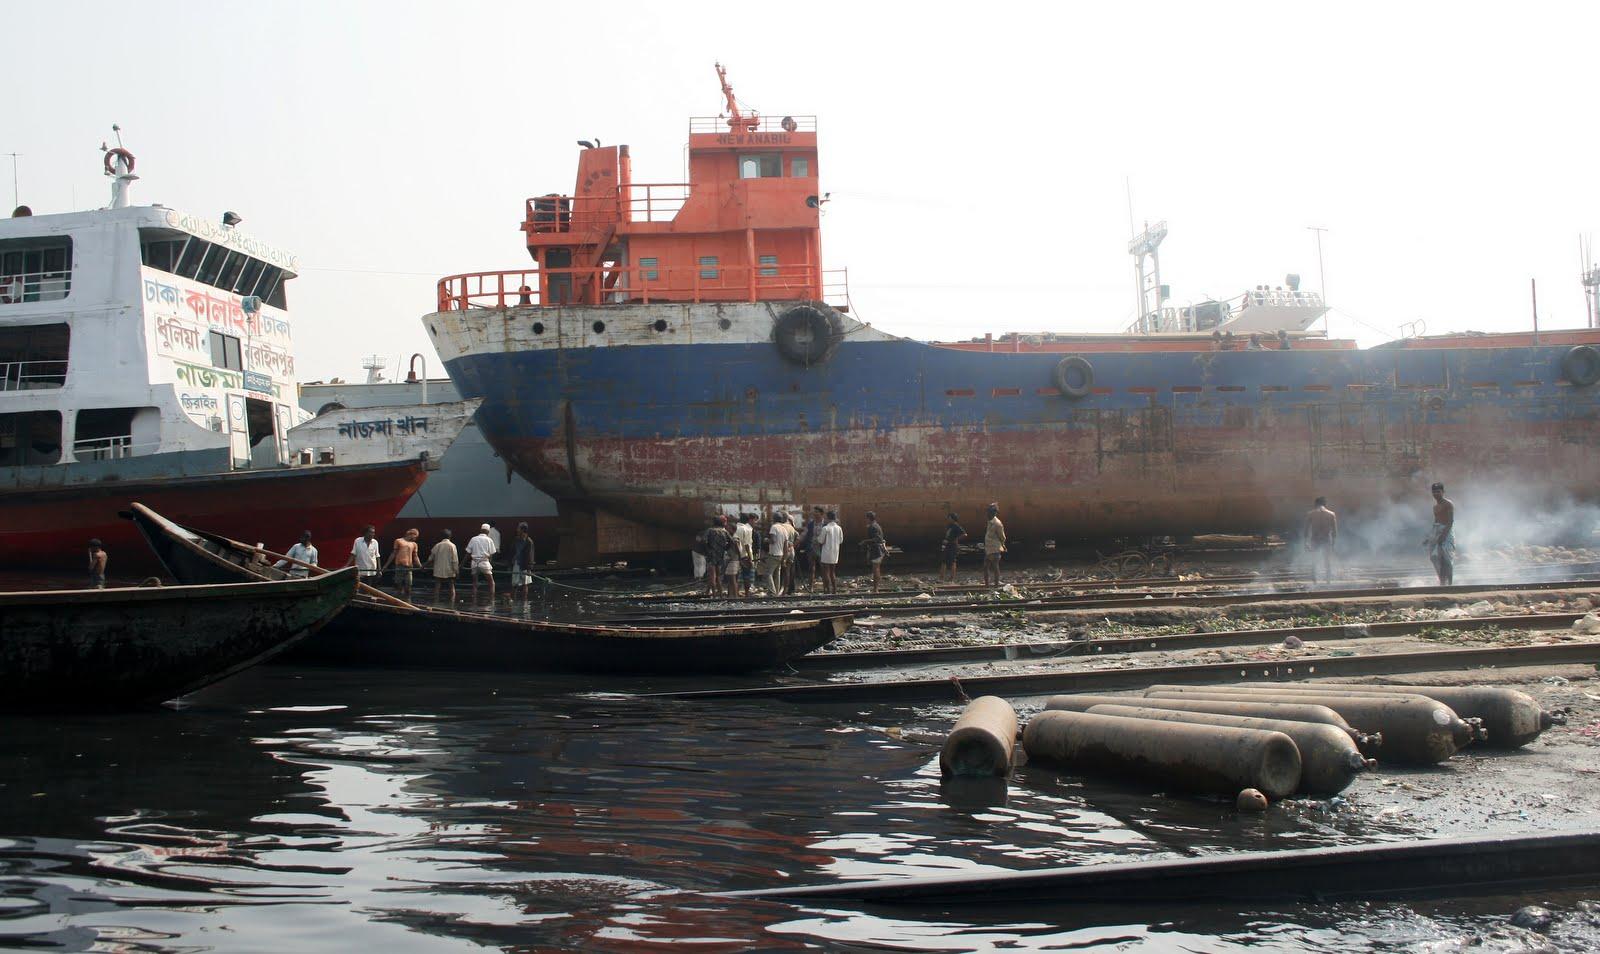 Skeppsbyggnad och renovering i Dhaka, Bangladesh.